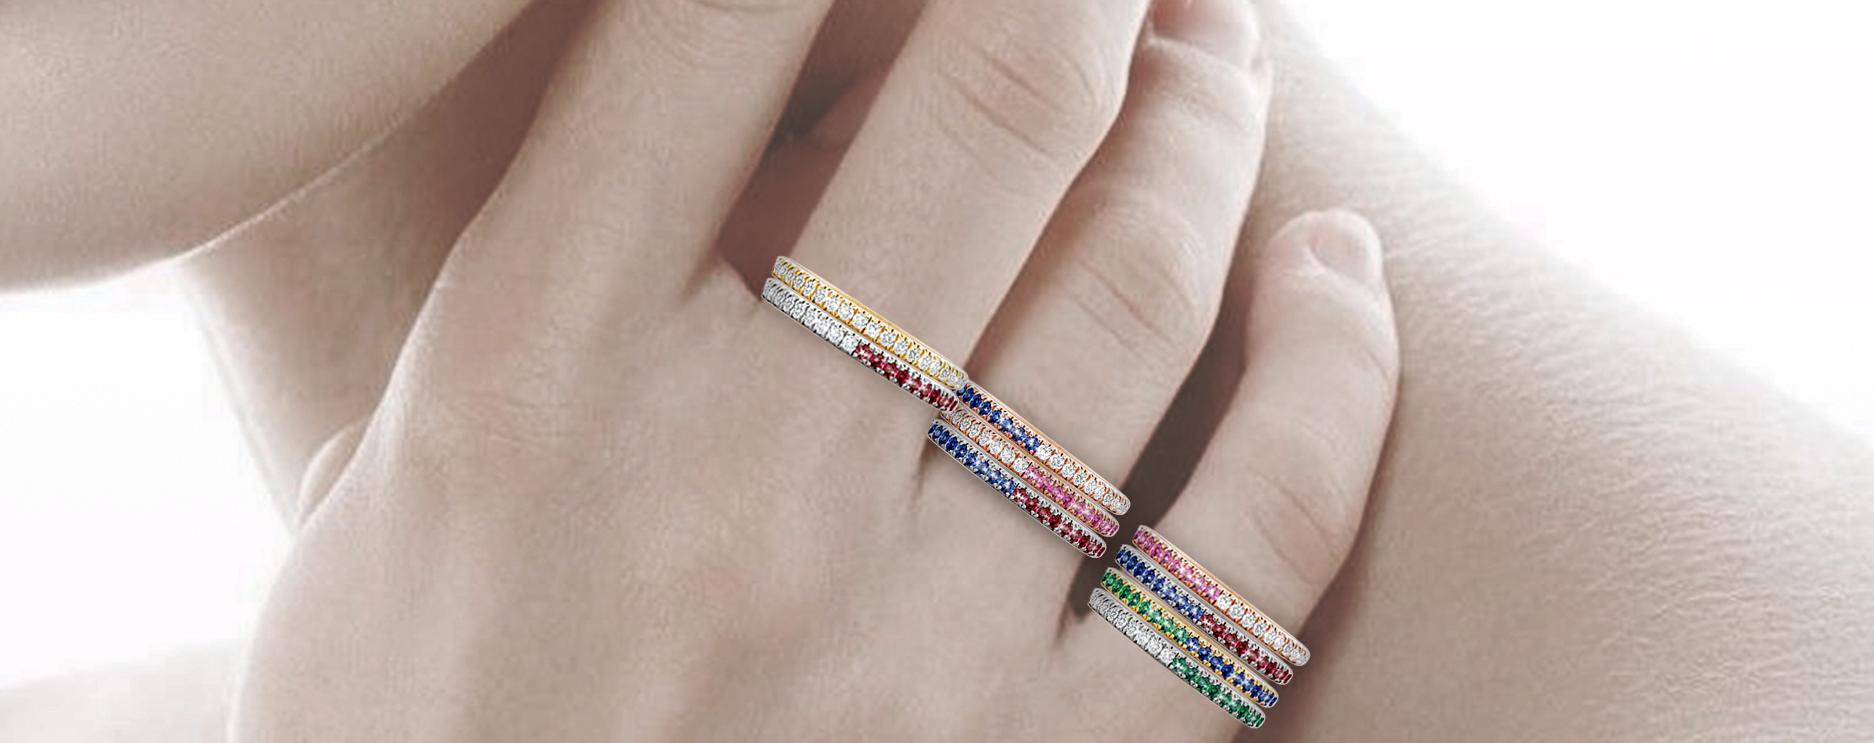 hugo-haan-coloured-stone-wedding-band-rings.jpg